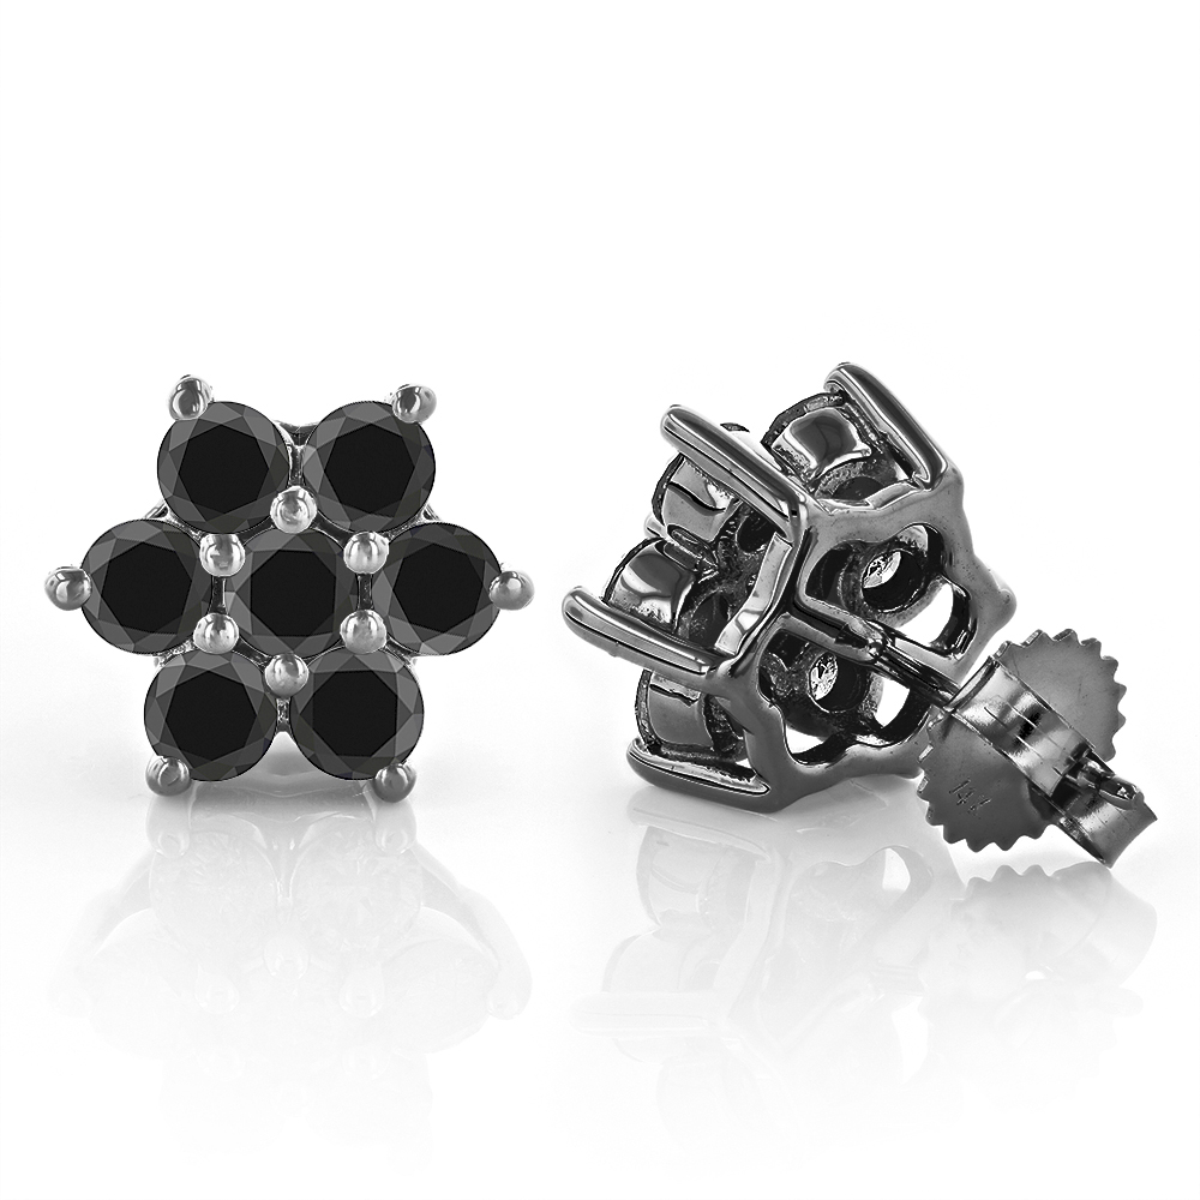 3 Carat Black Diamond Stud Earrings Clusters 14K Gold